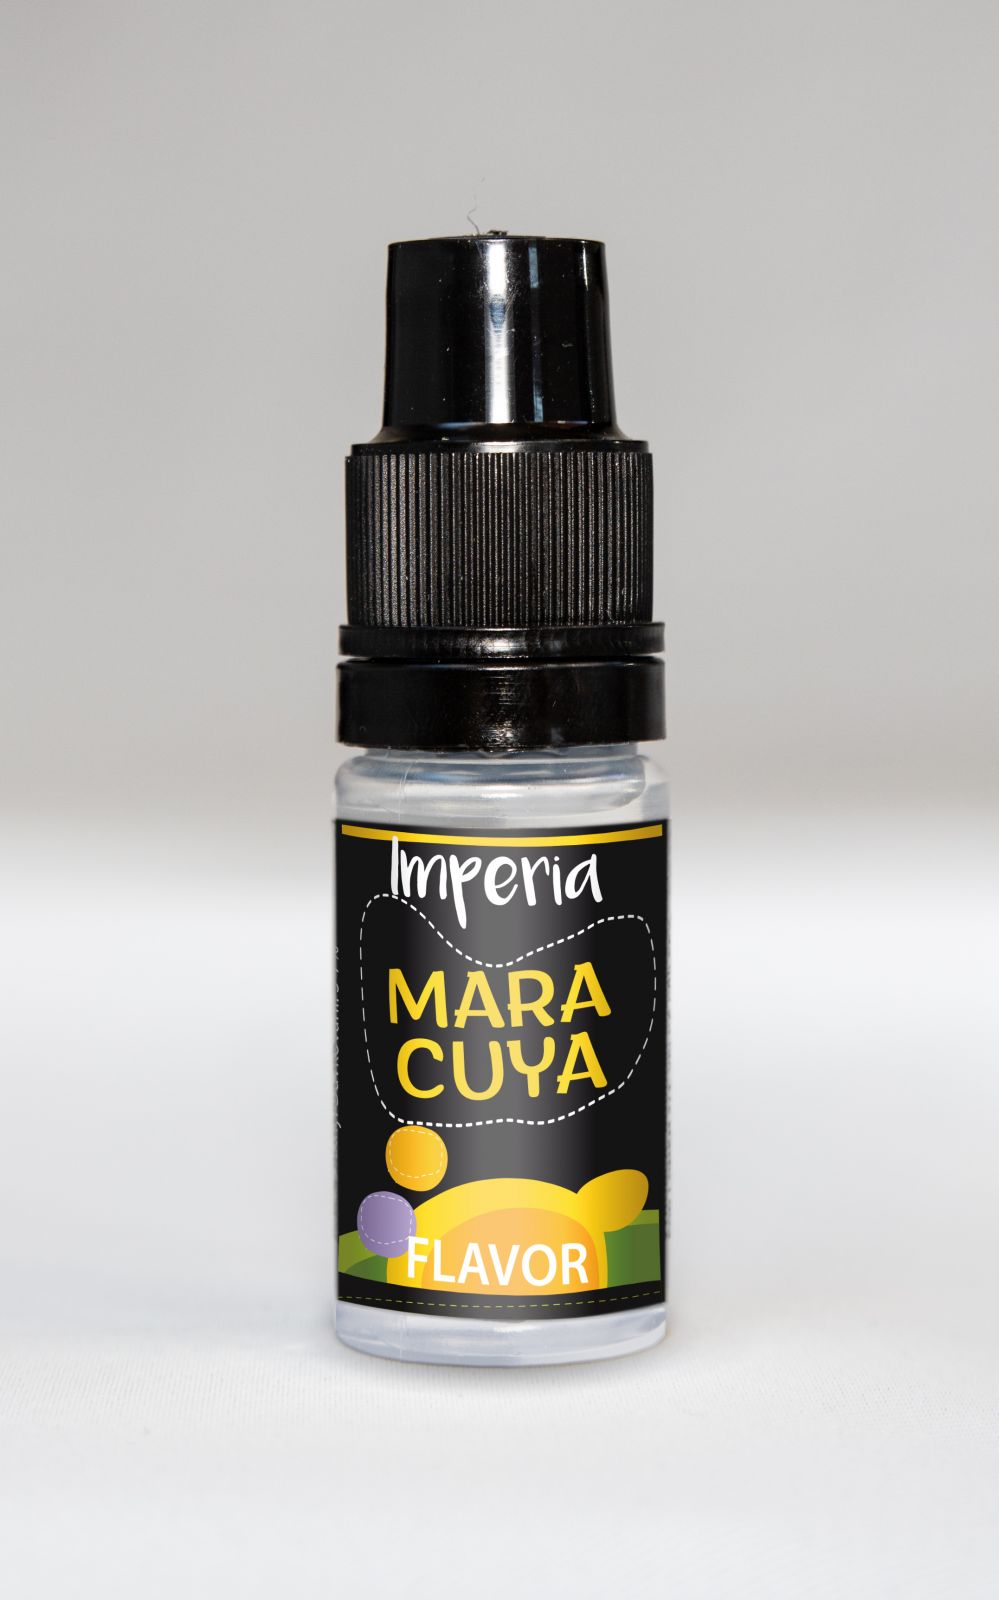 MARACUYA - Aroma Imperia Black Label Boudoir Samadhi s.r.o.